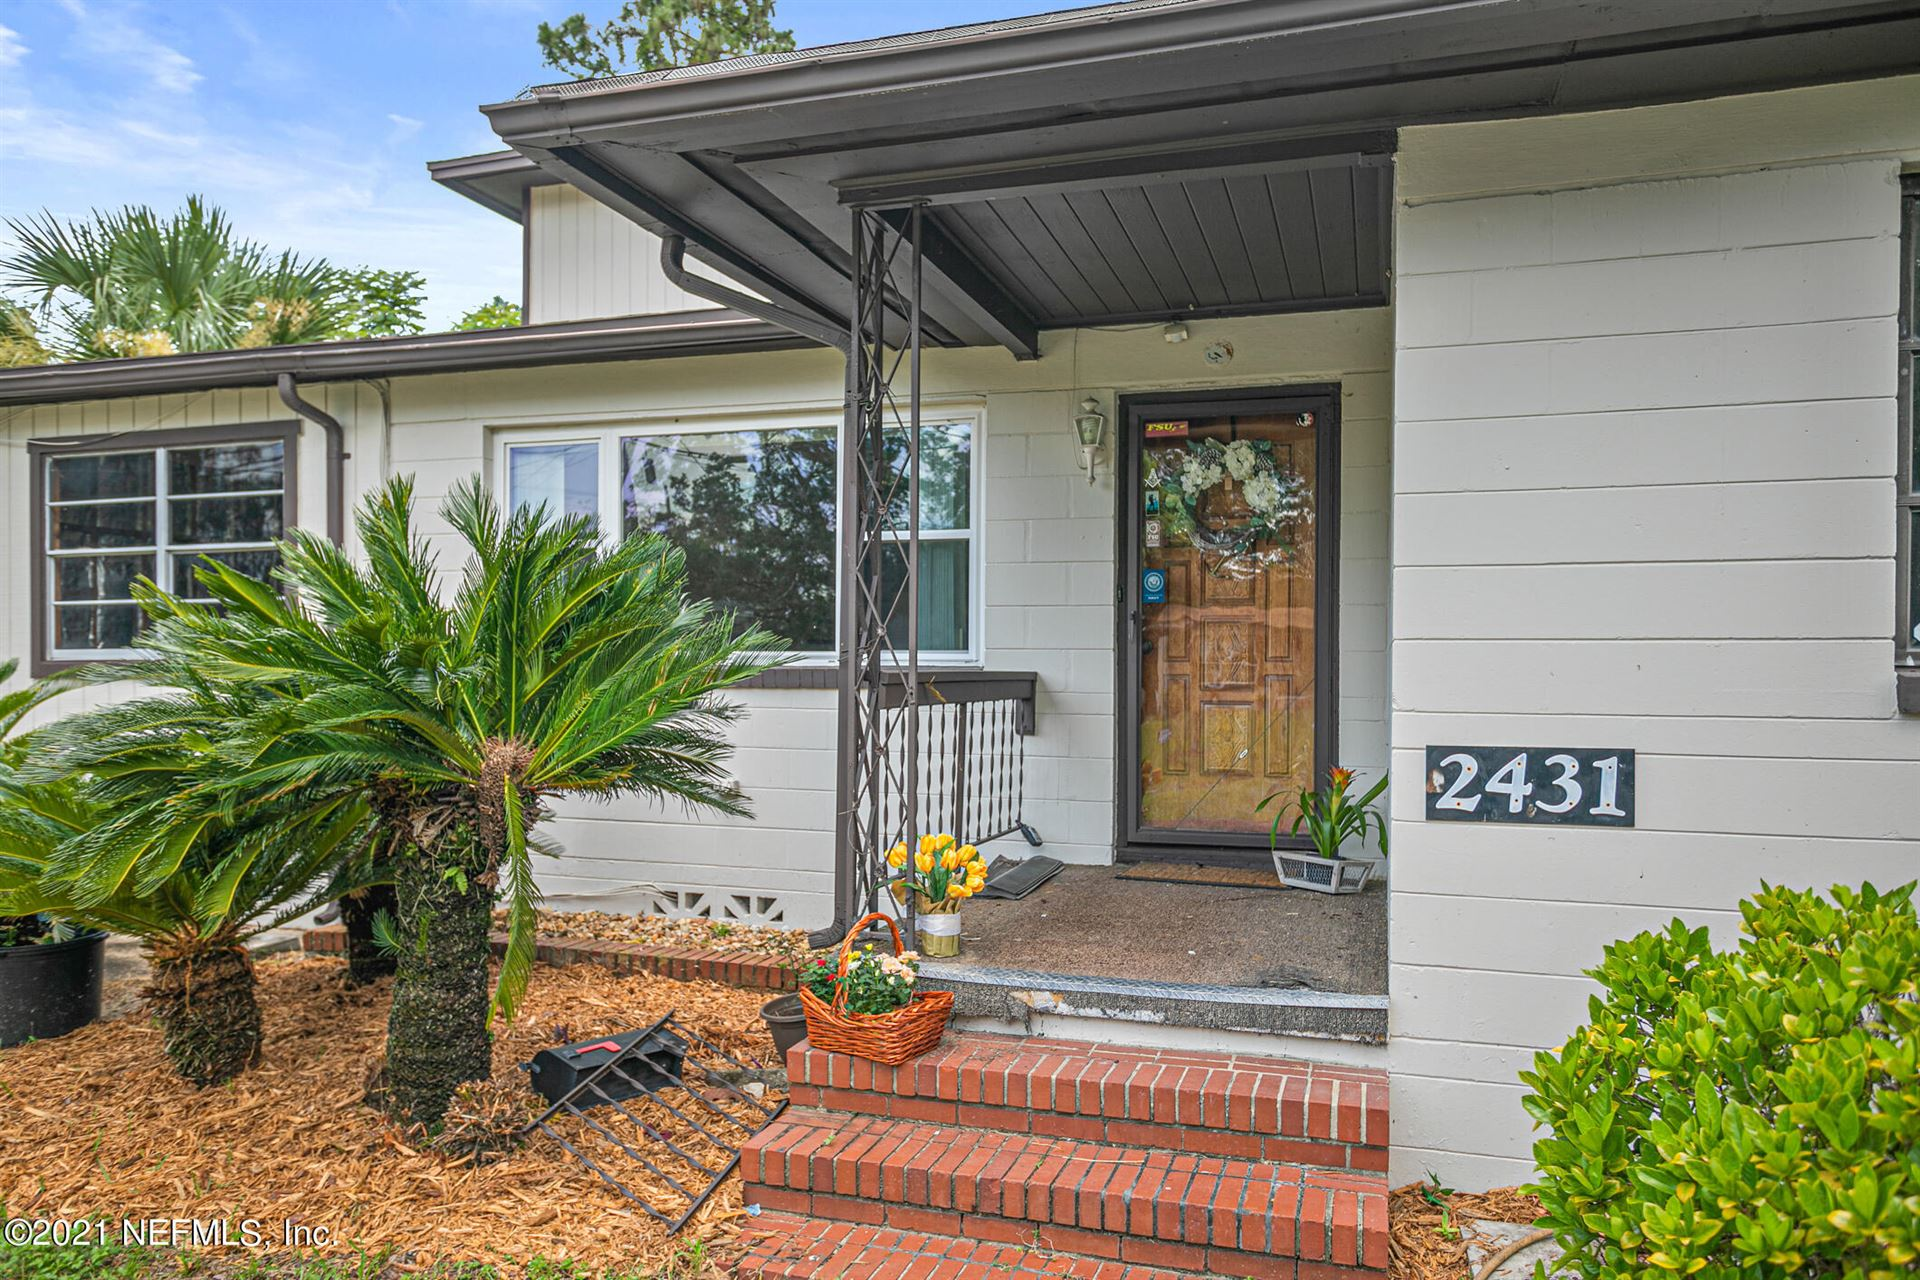 2431 CALADIUM RD #Unit No: 24-8 Lot No, Jacksonville, FL 32211 - MLS#: 1125155